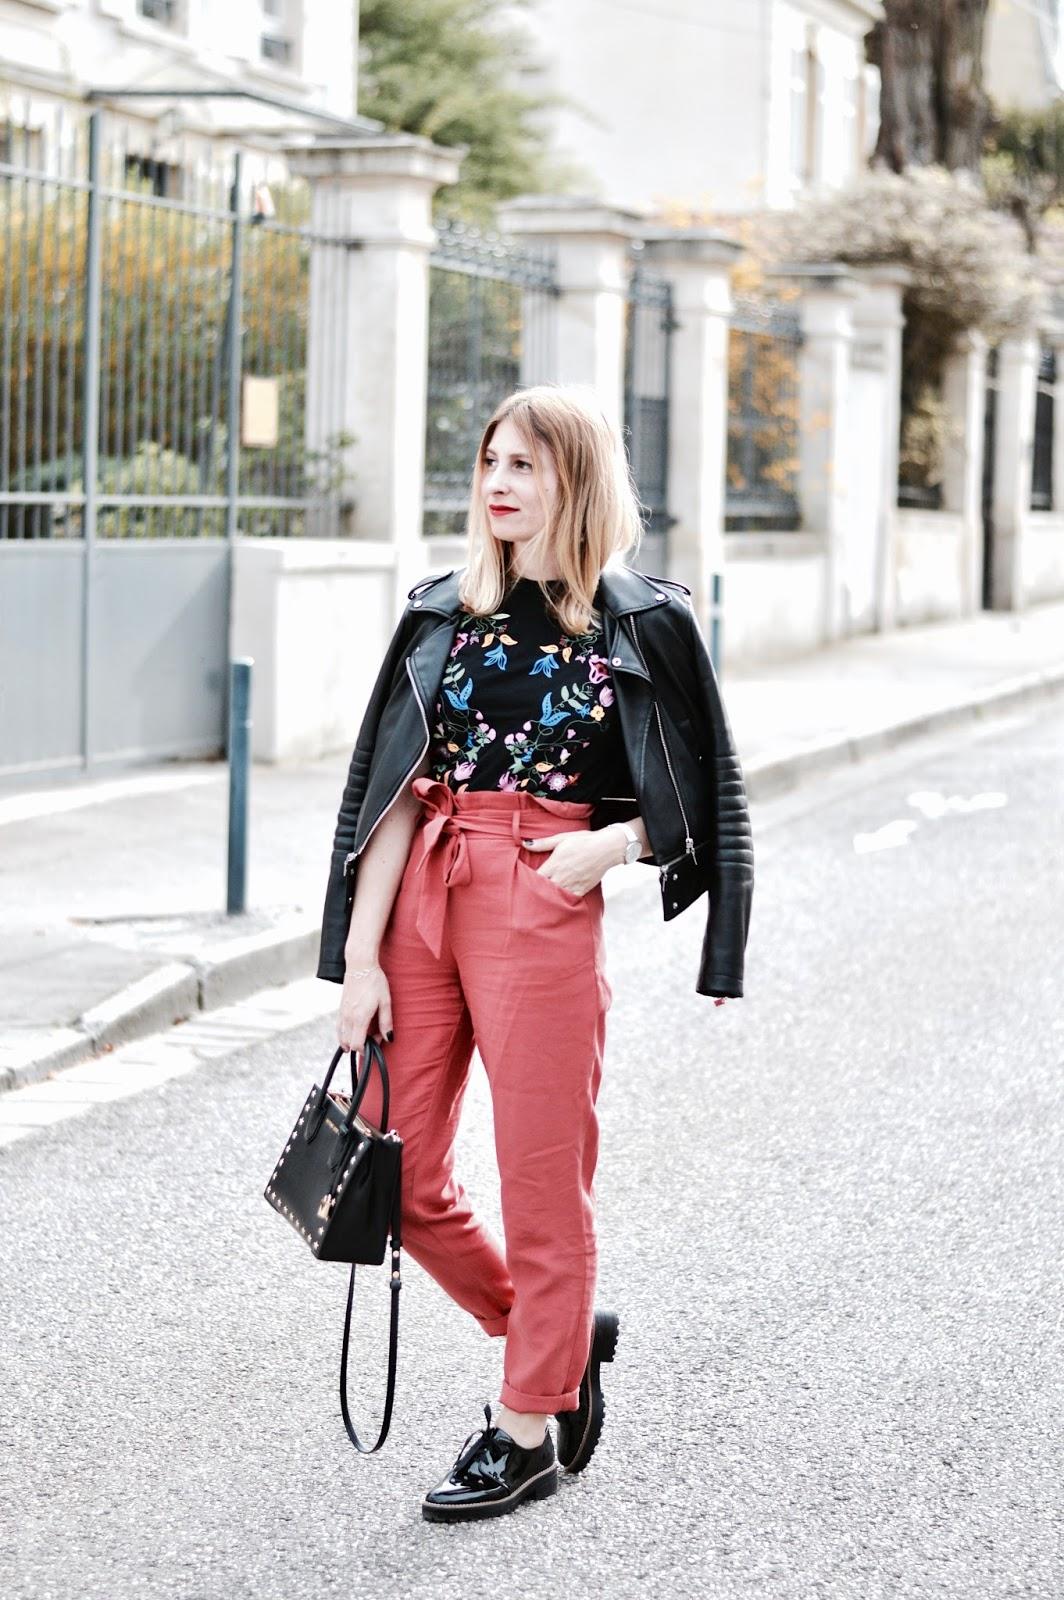 Look Printemps : pantalon rouille et teeshirt fleurs